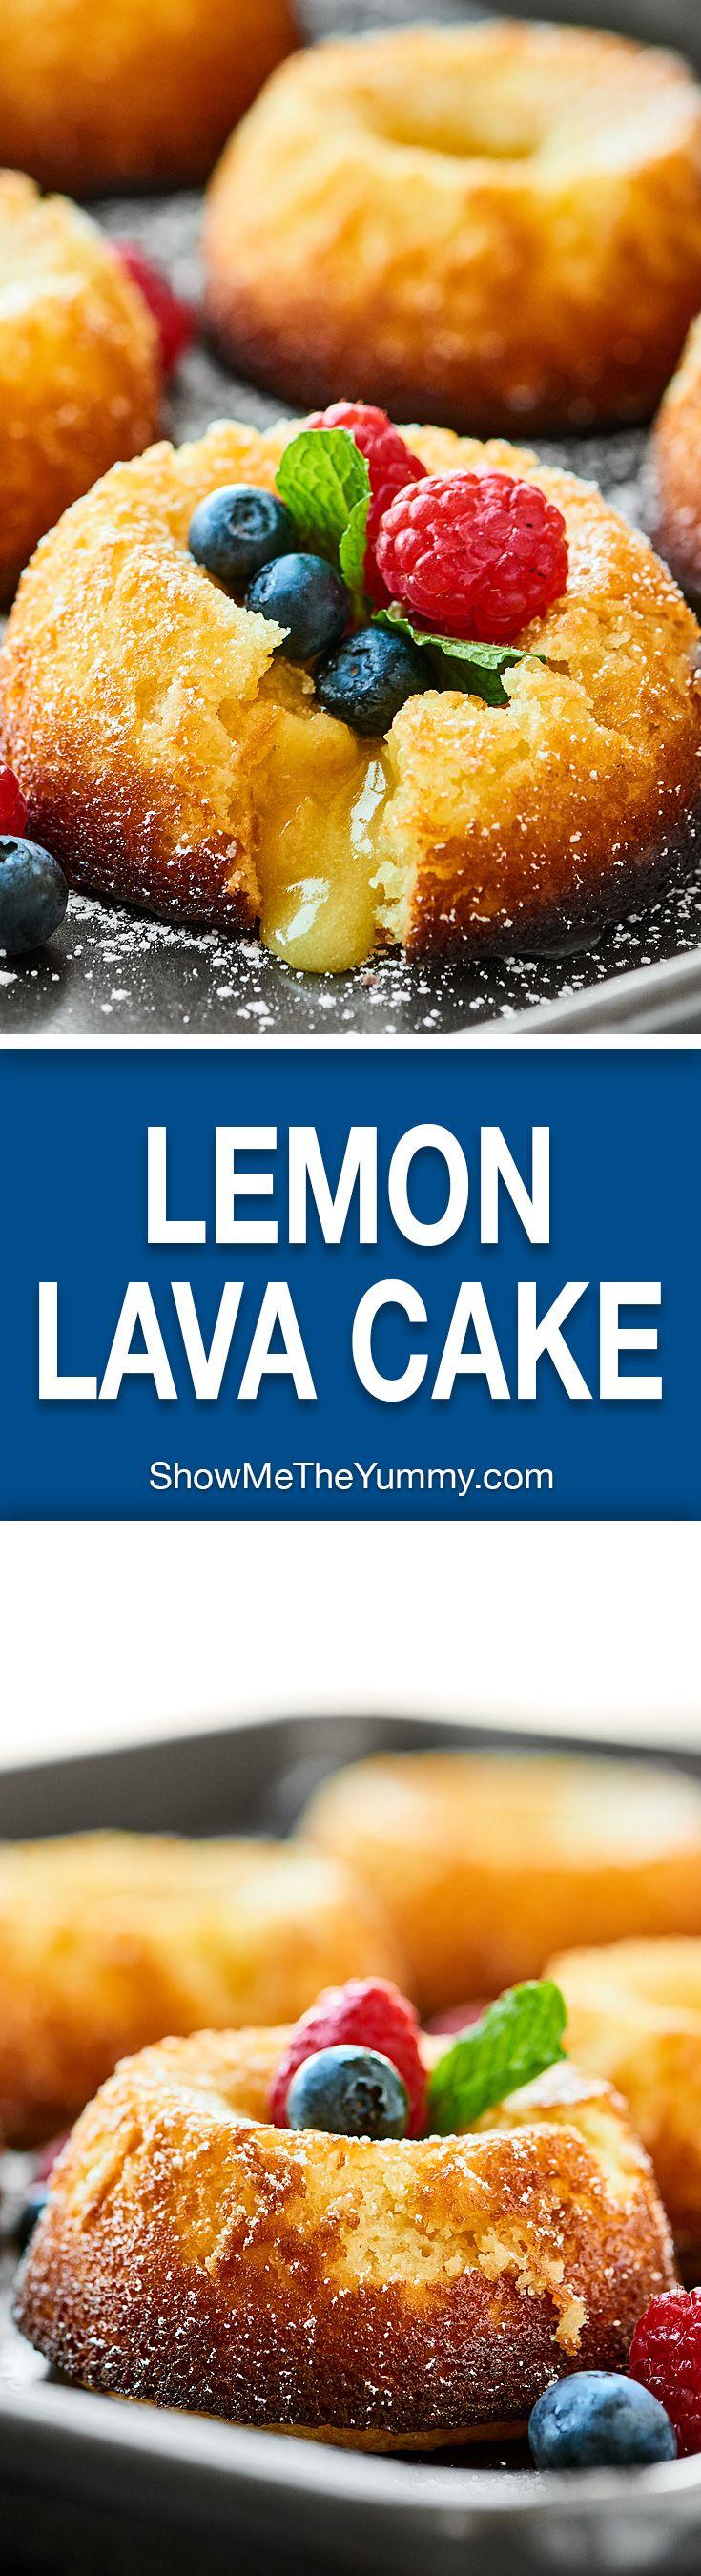 An ultra tender cake with slightly crisp edges and a perfectly white chocolate lemon-y molten lava gooey center, this Lemon Lava Cake is surprisingly easy and so decadent! showmetheyummy.com #lemonlavacake #moltenlavacake